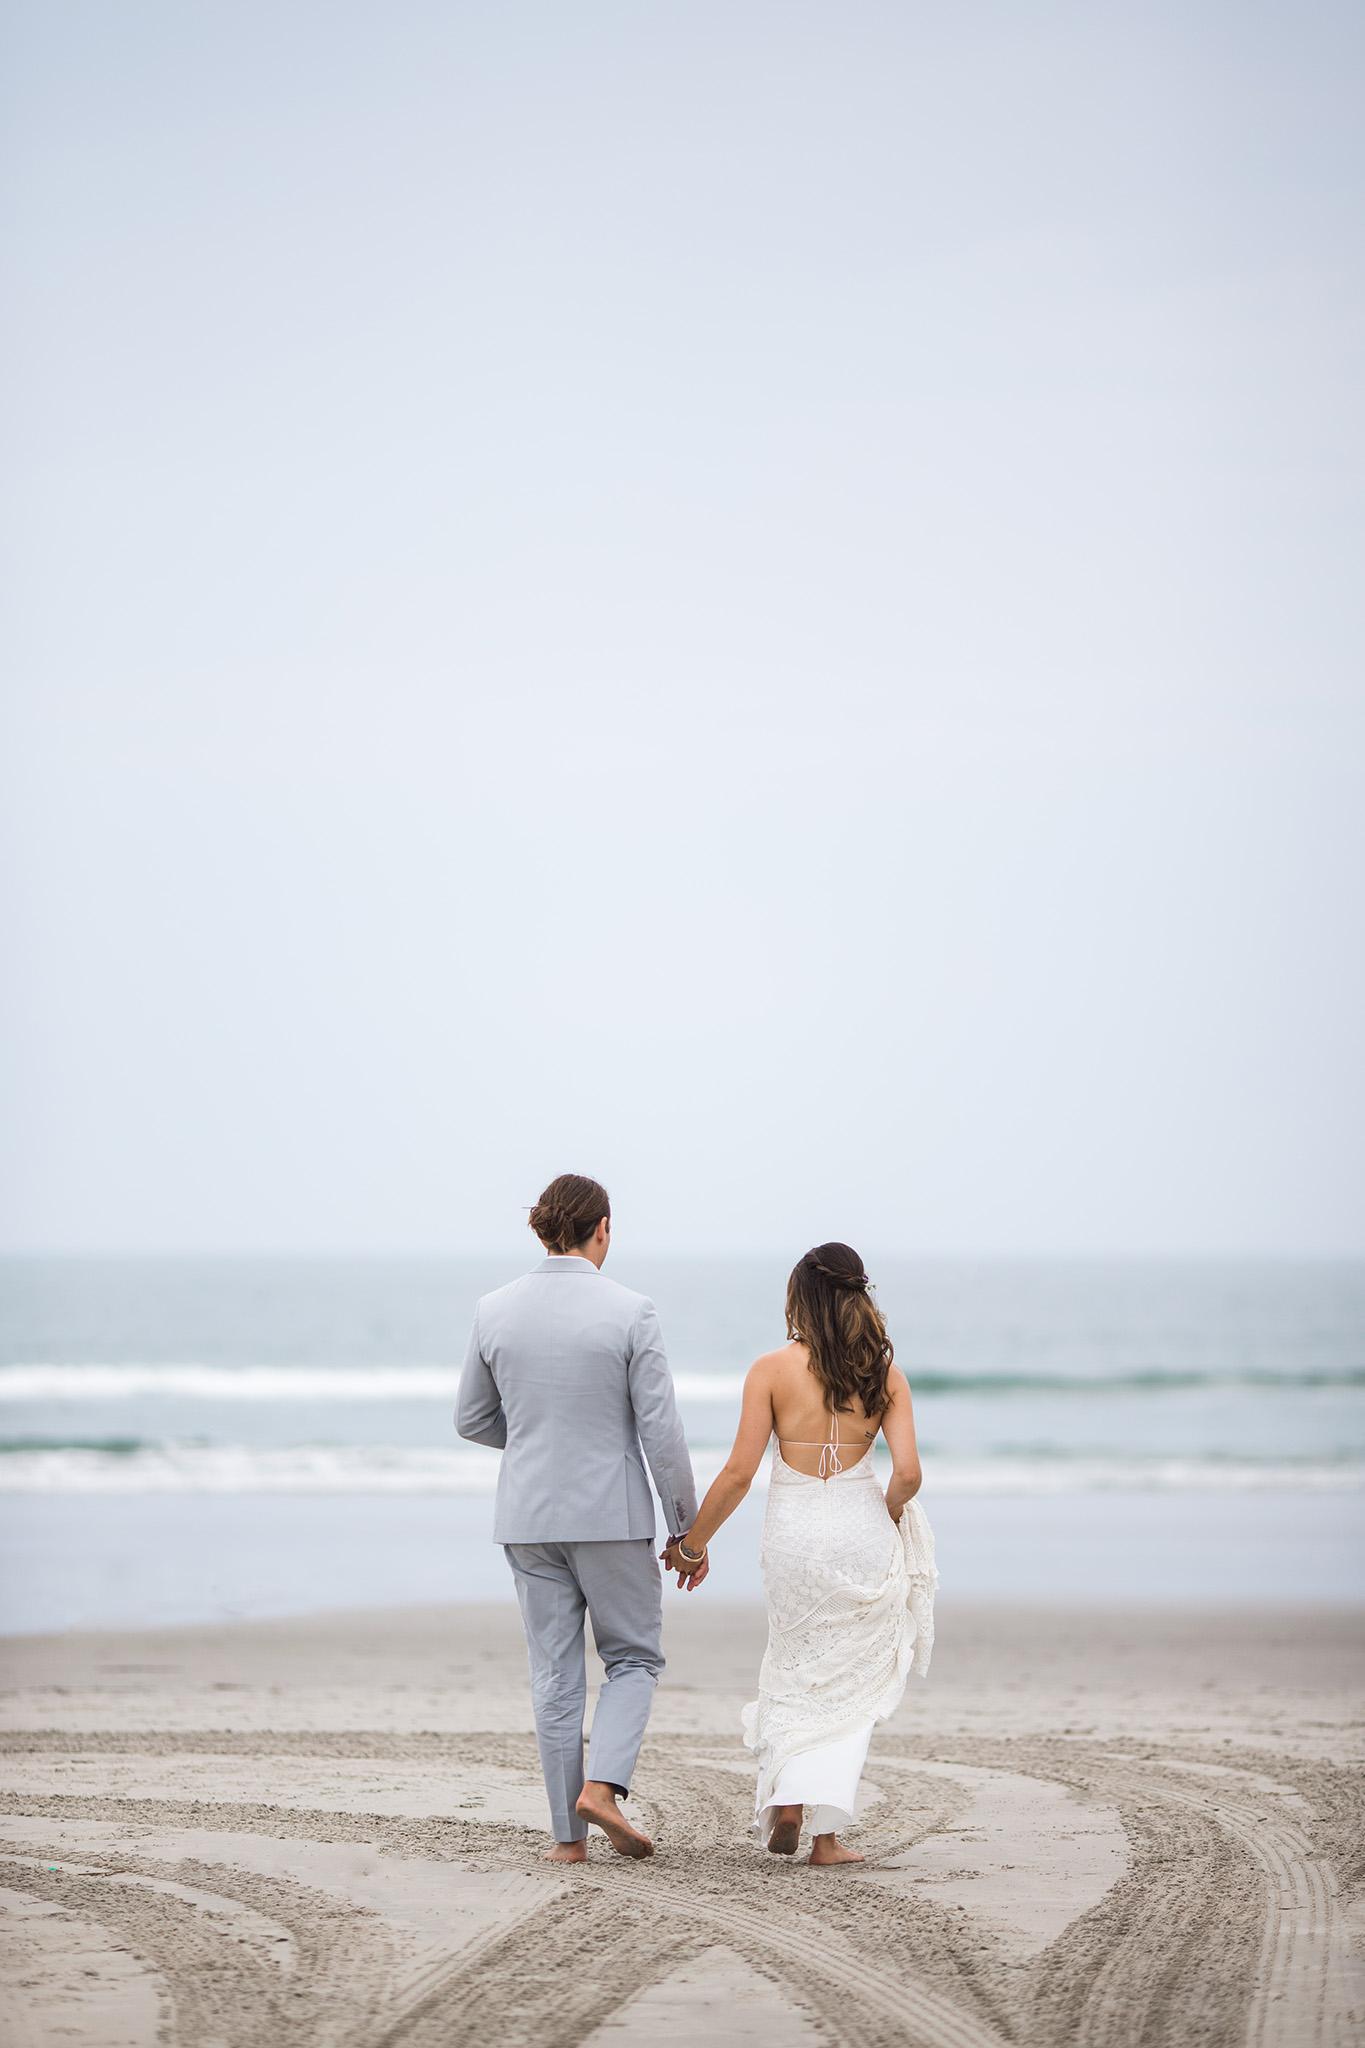 icona_diamond_beach_wedding_11.jpg